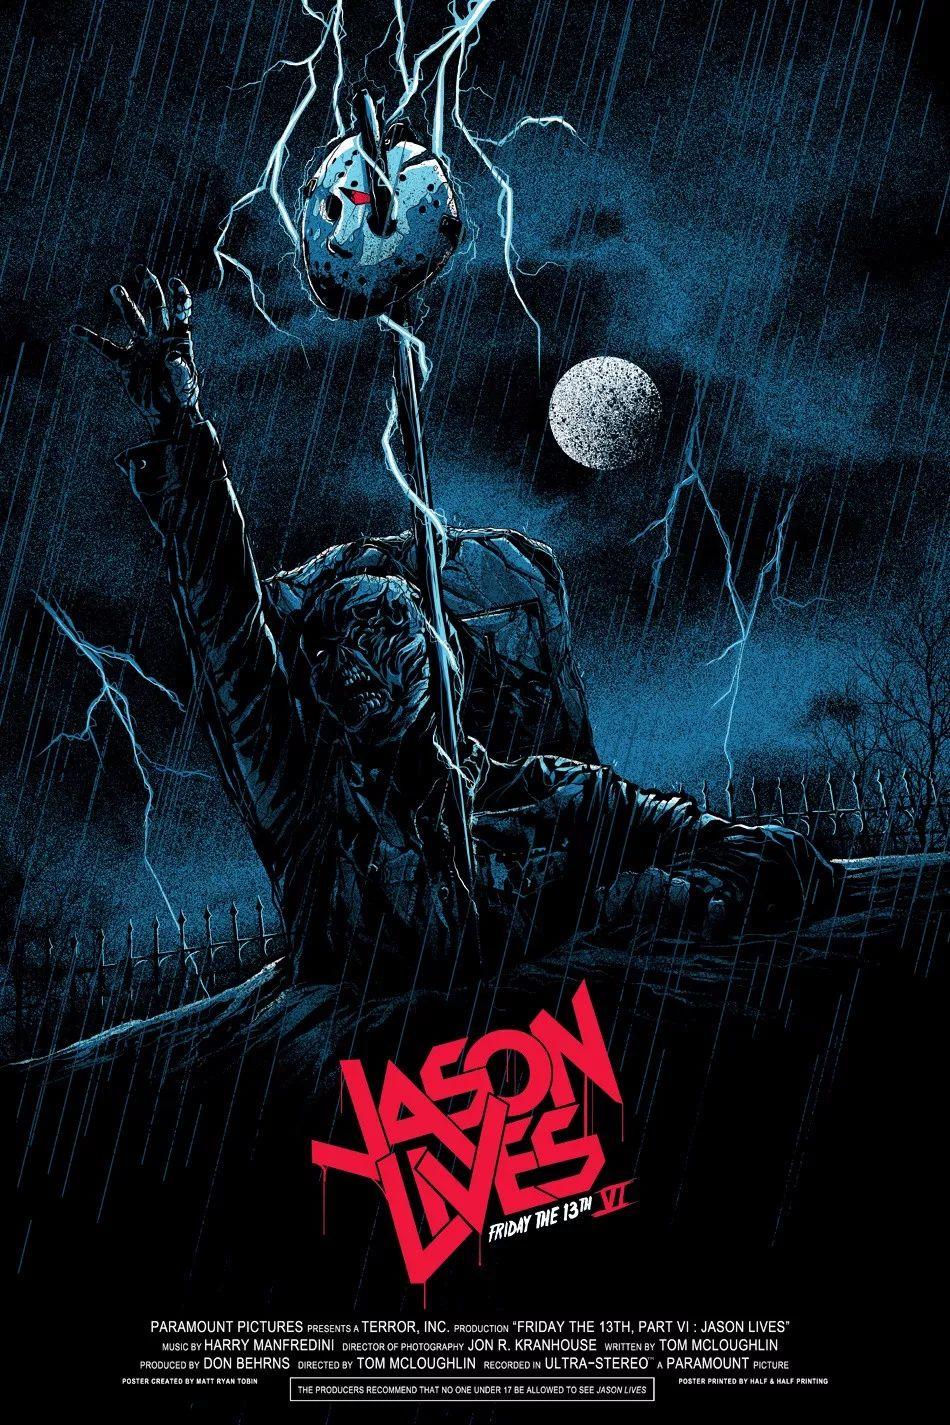 Jason Lives! Matt Ryan